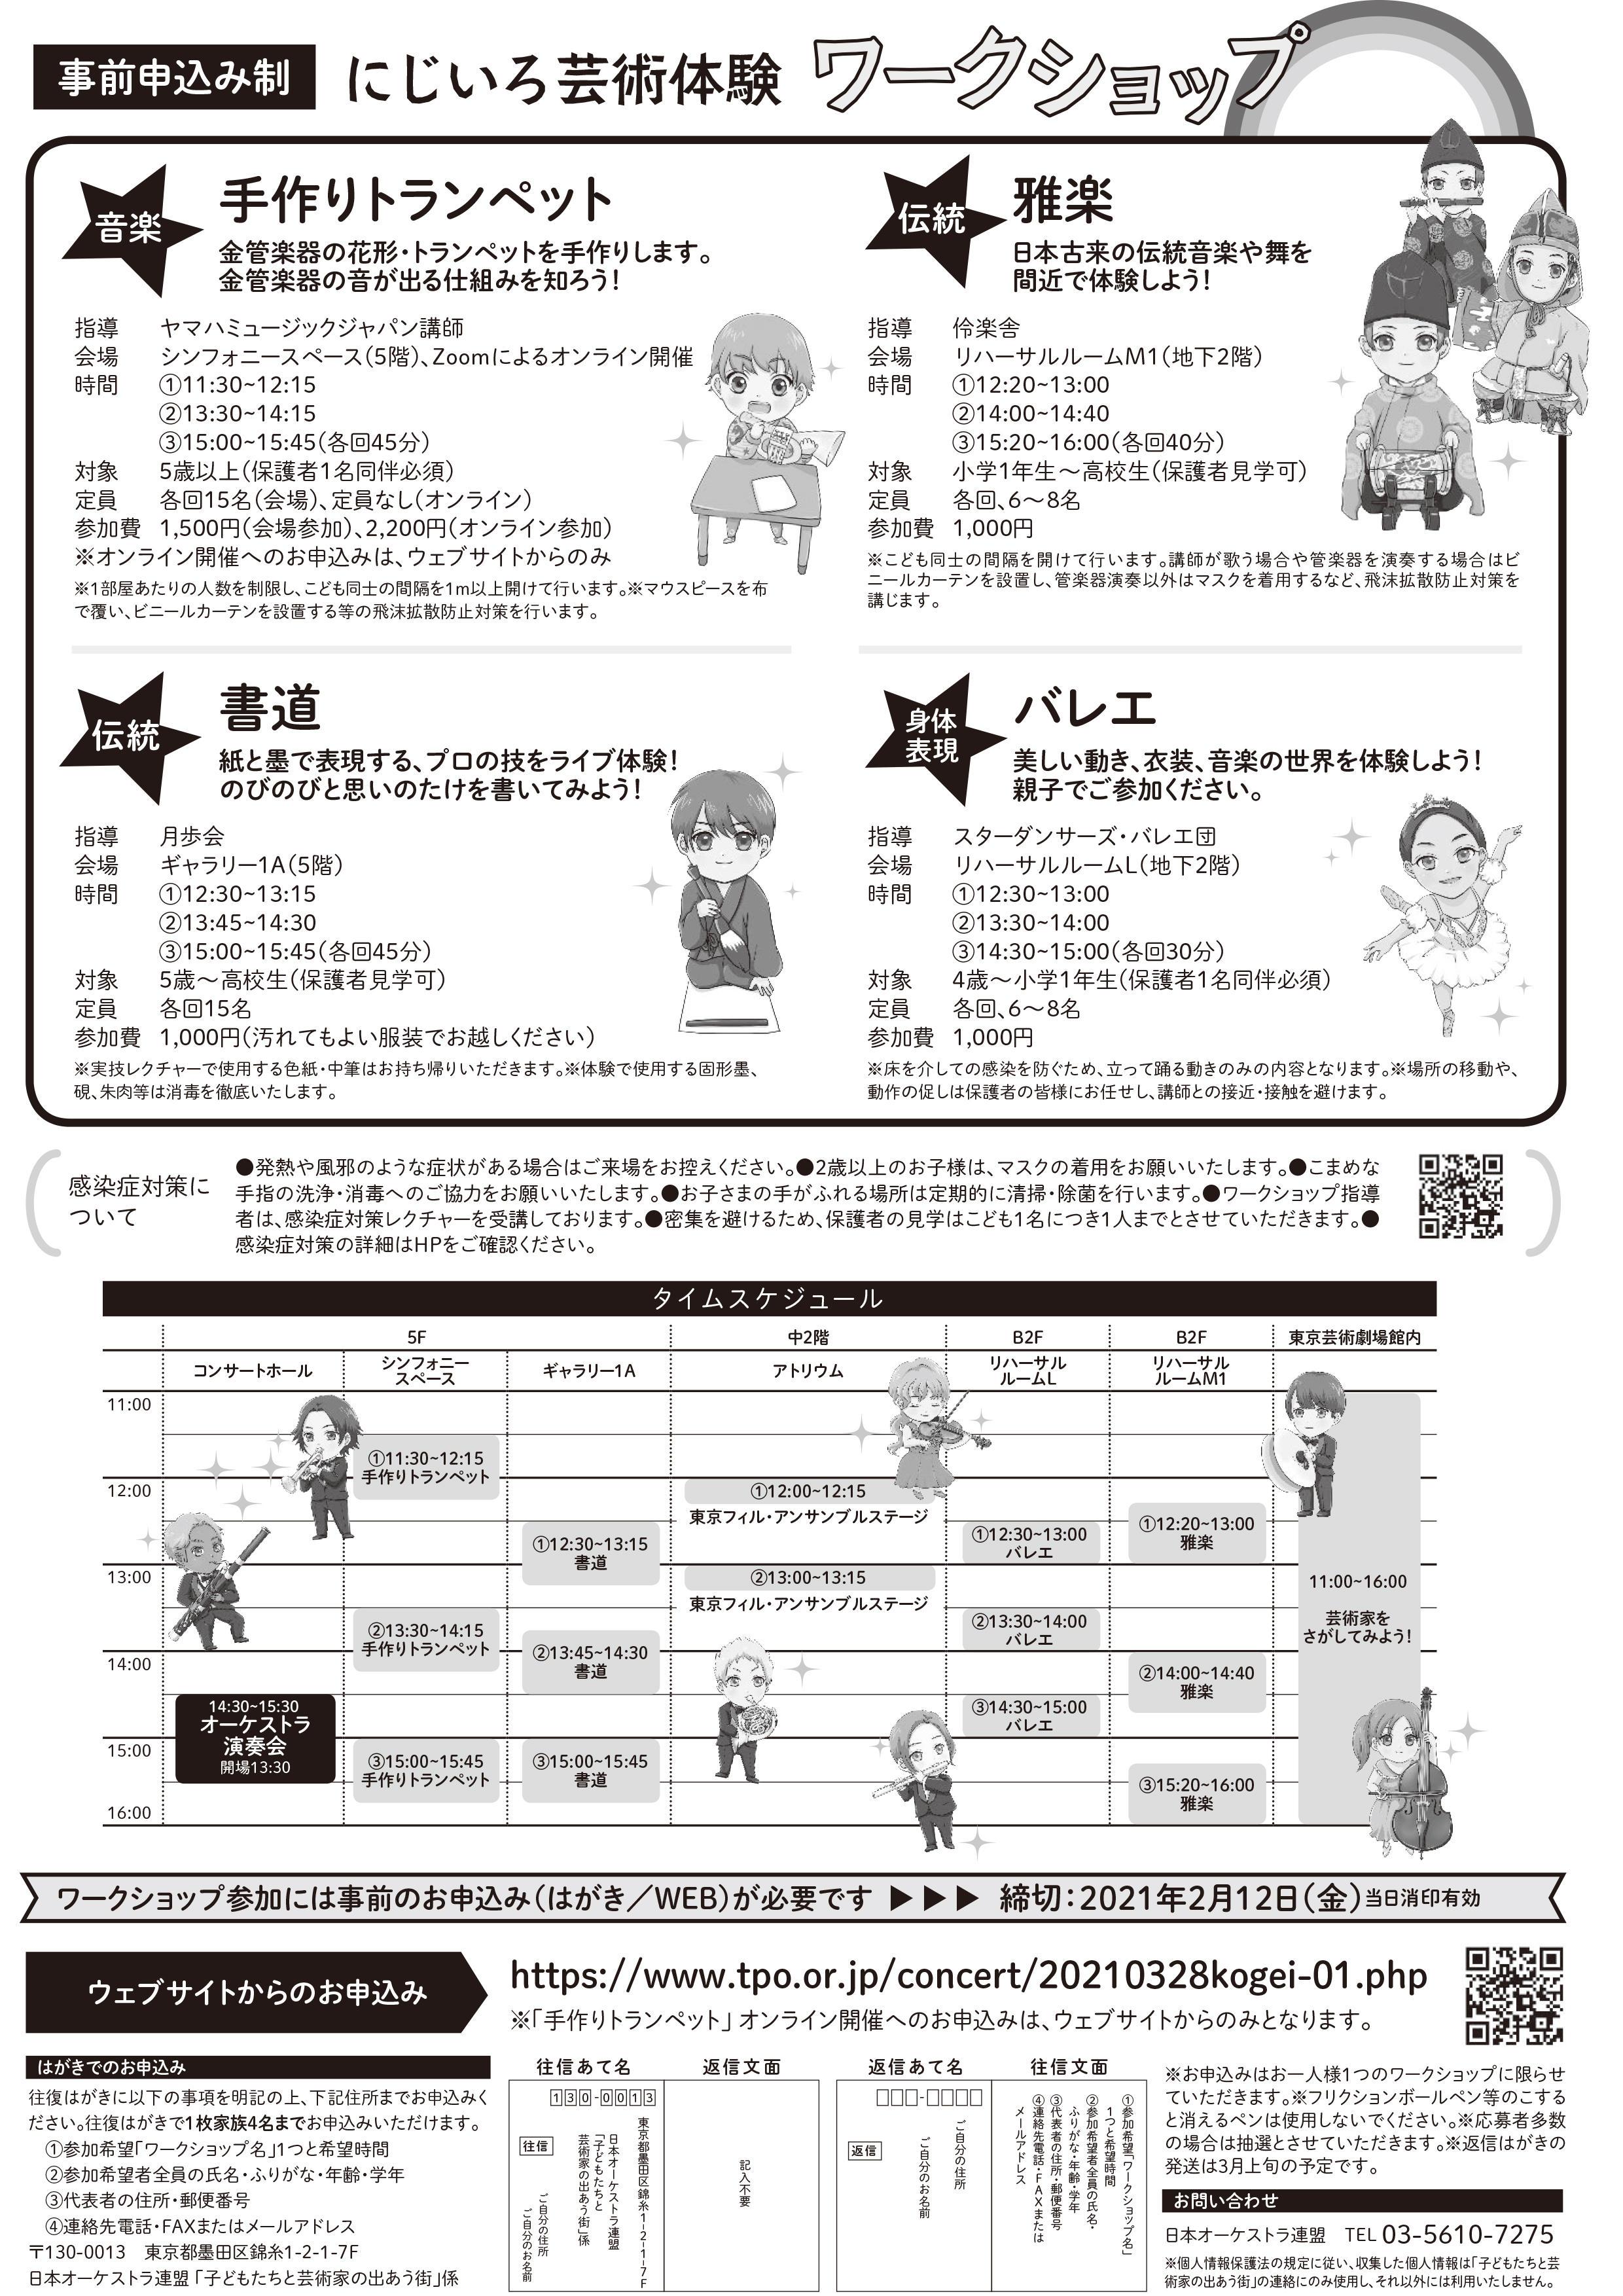 https://www.orchestra.or.jp/information/uploads/A3_kogei_web-4.jpg